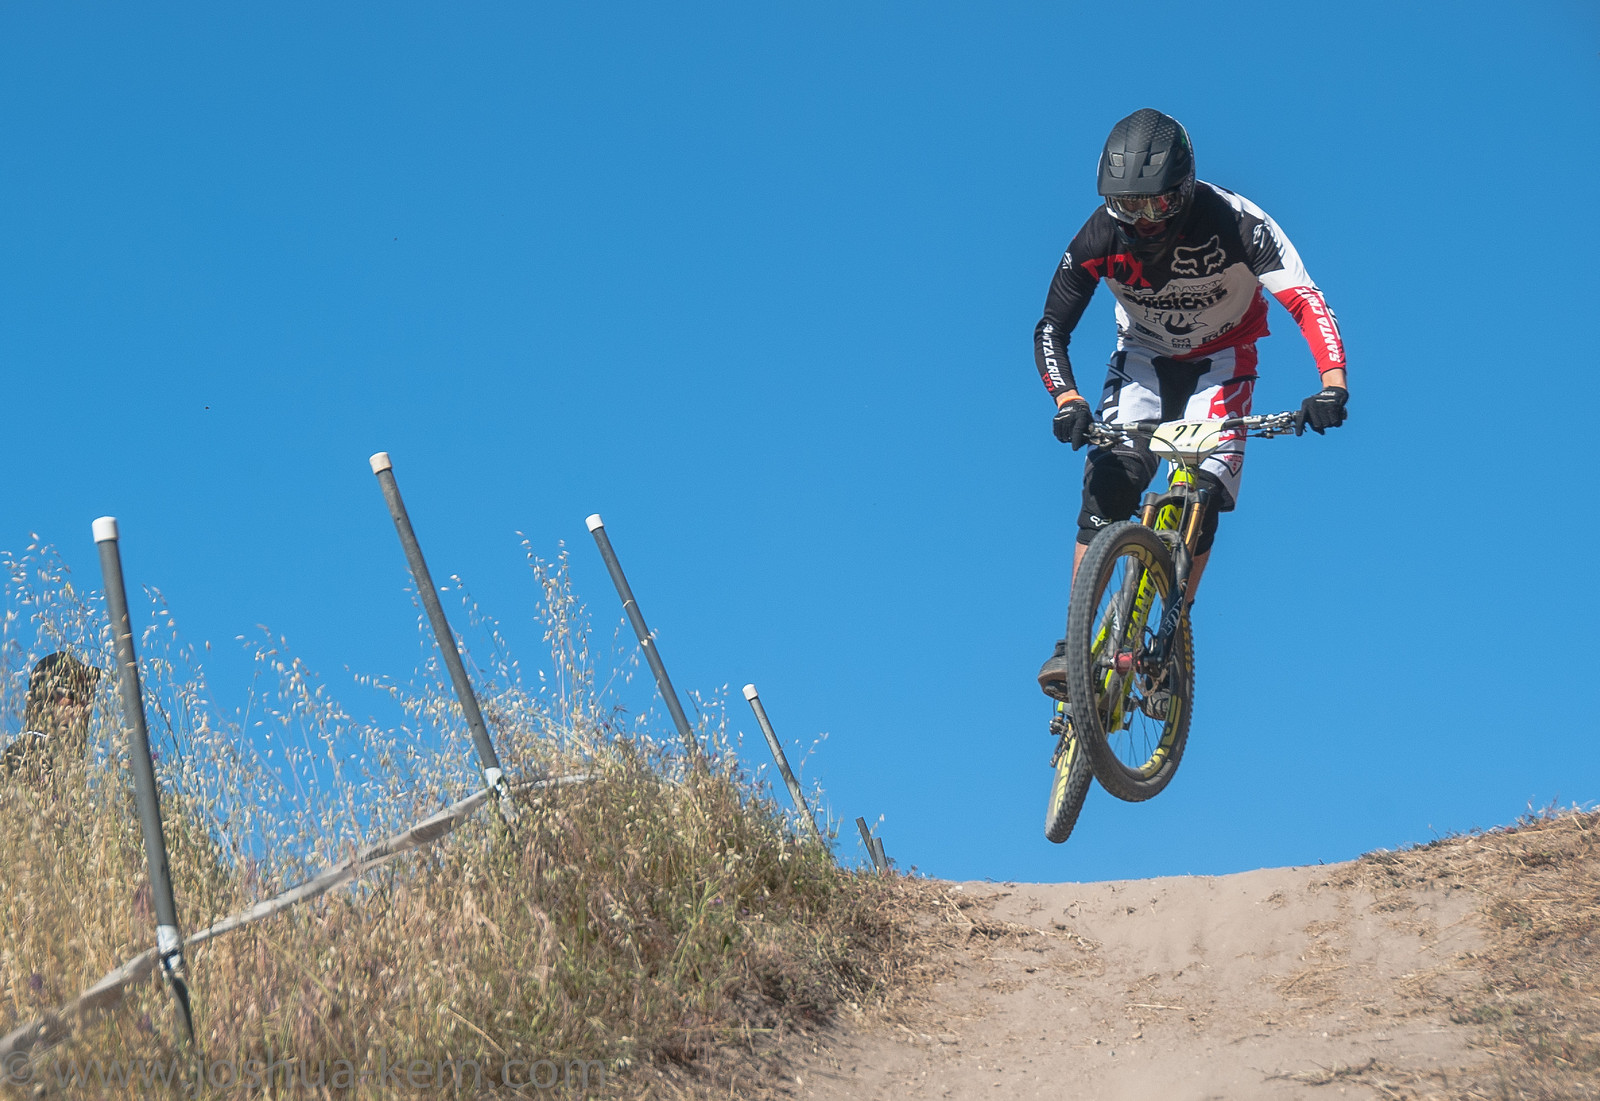 4-19-13DHPractice (27 of 36) - jkern620 - Mountain Biking Pictures - Vital MTB